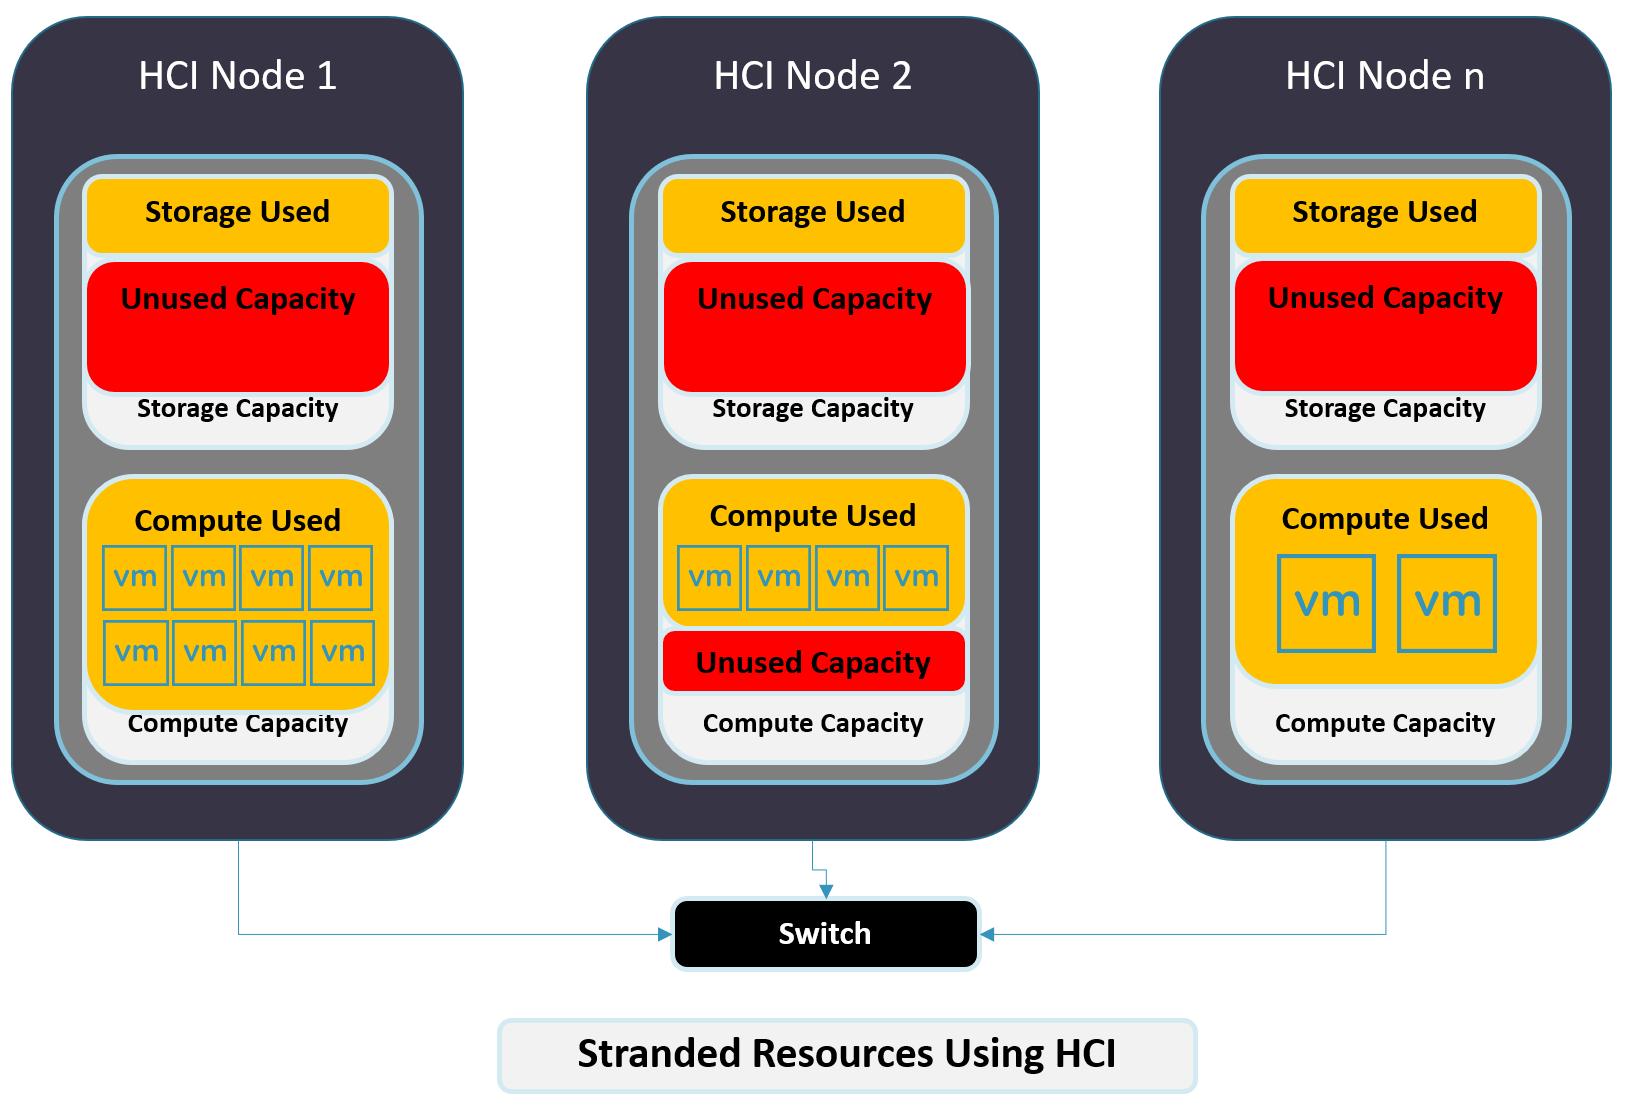 HPE Nimble dHCI standard